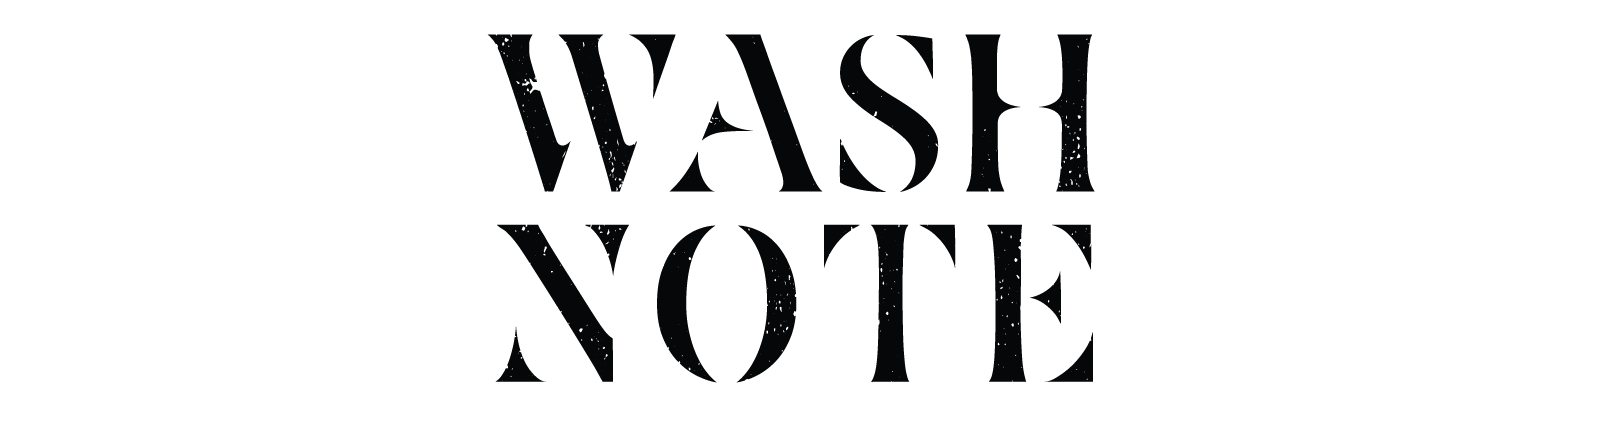 WASHNote